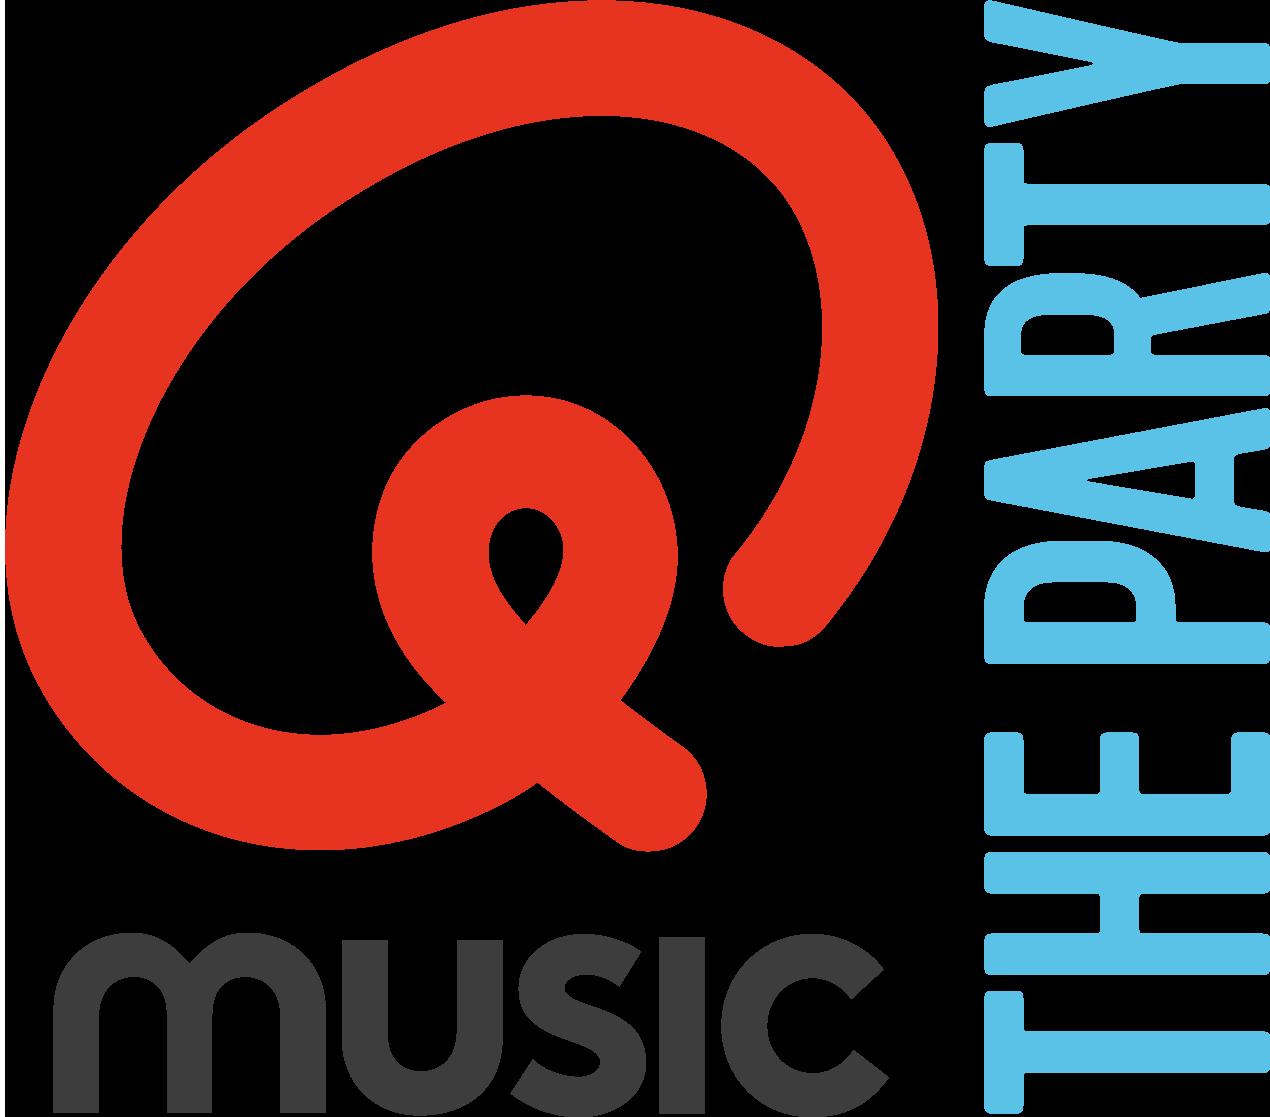 Qmusic_TheParty_BL_RGB